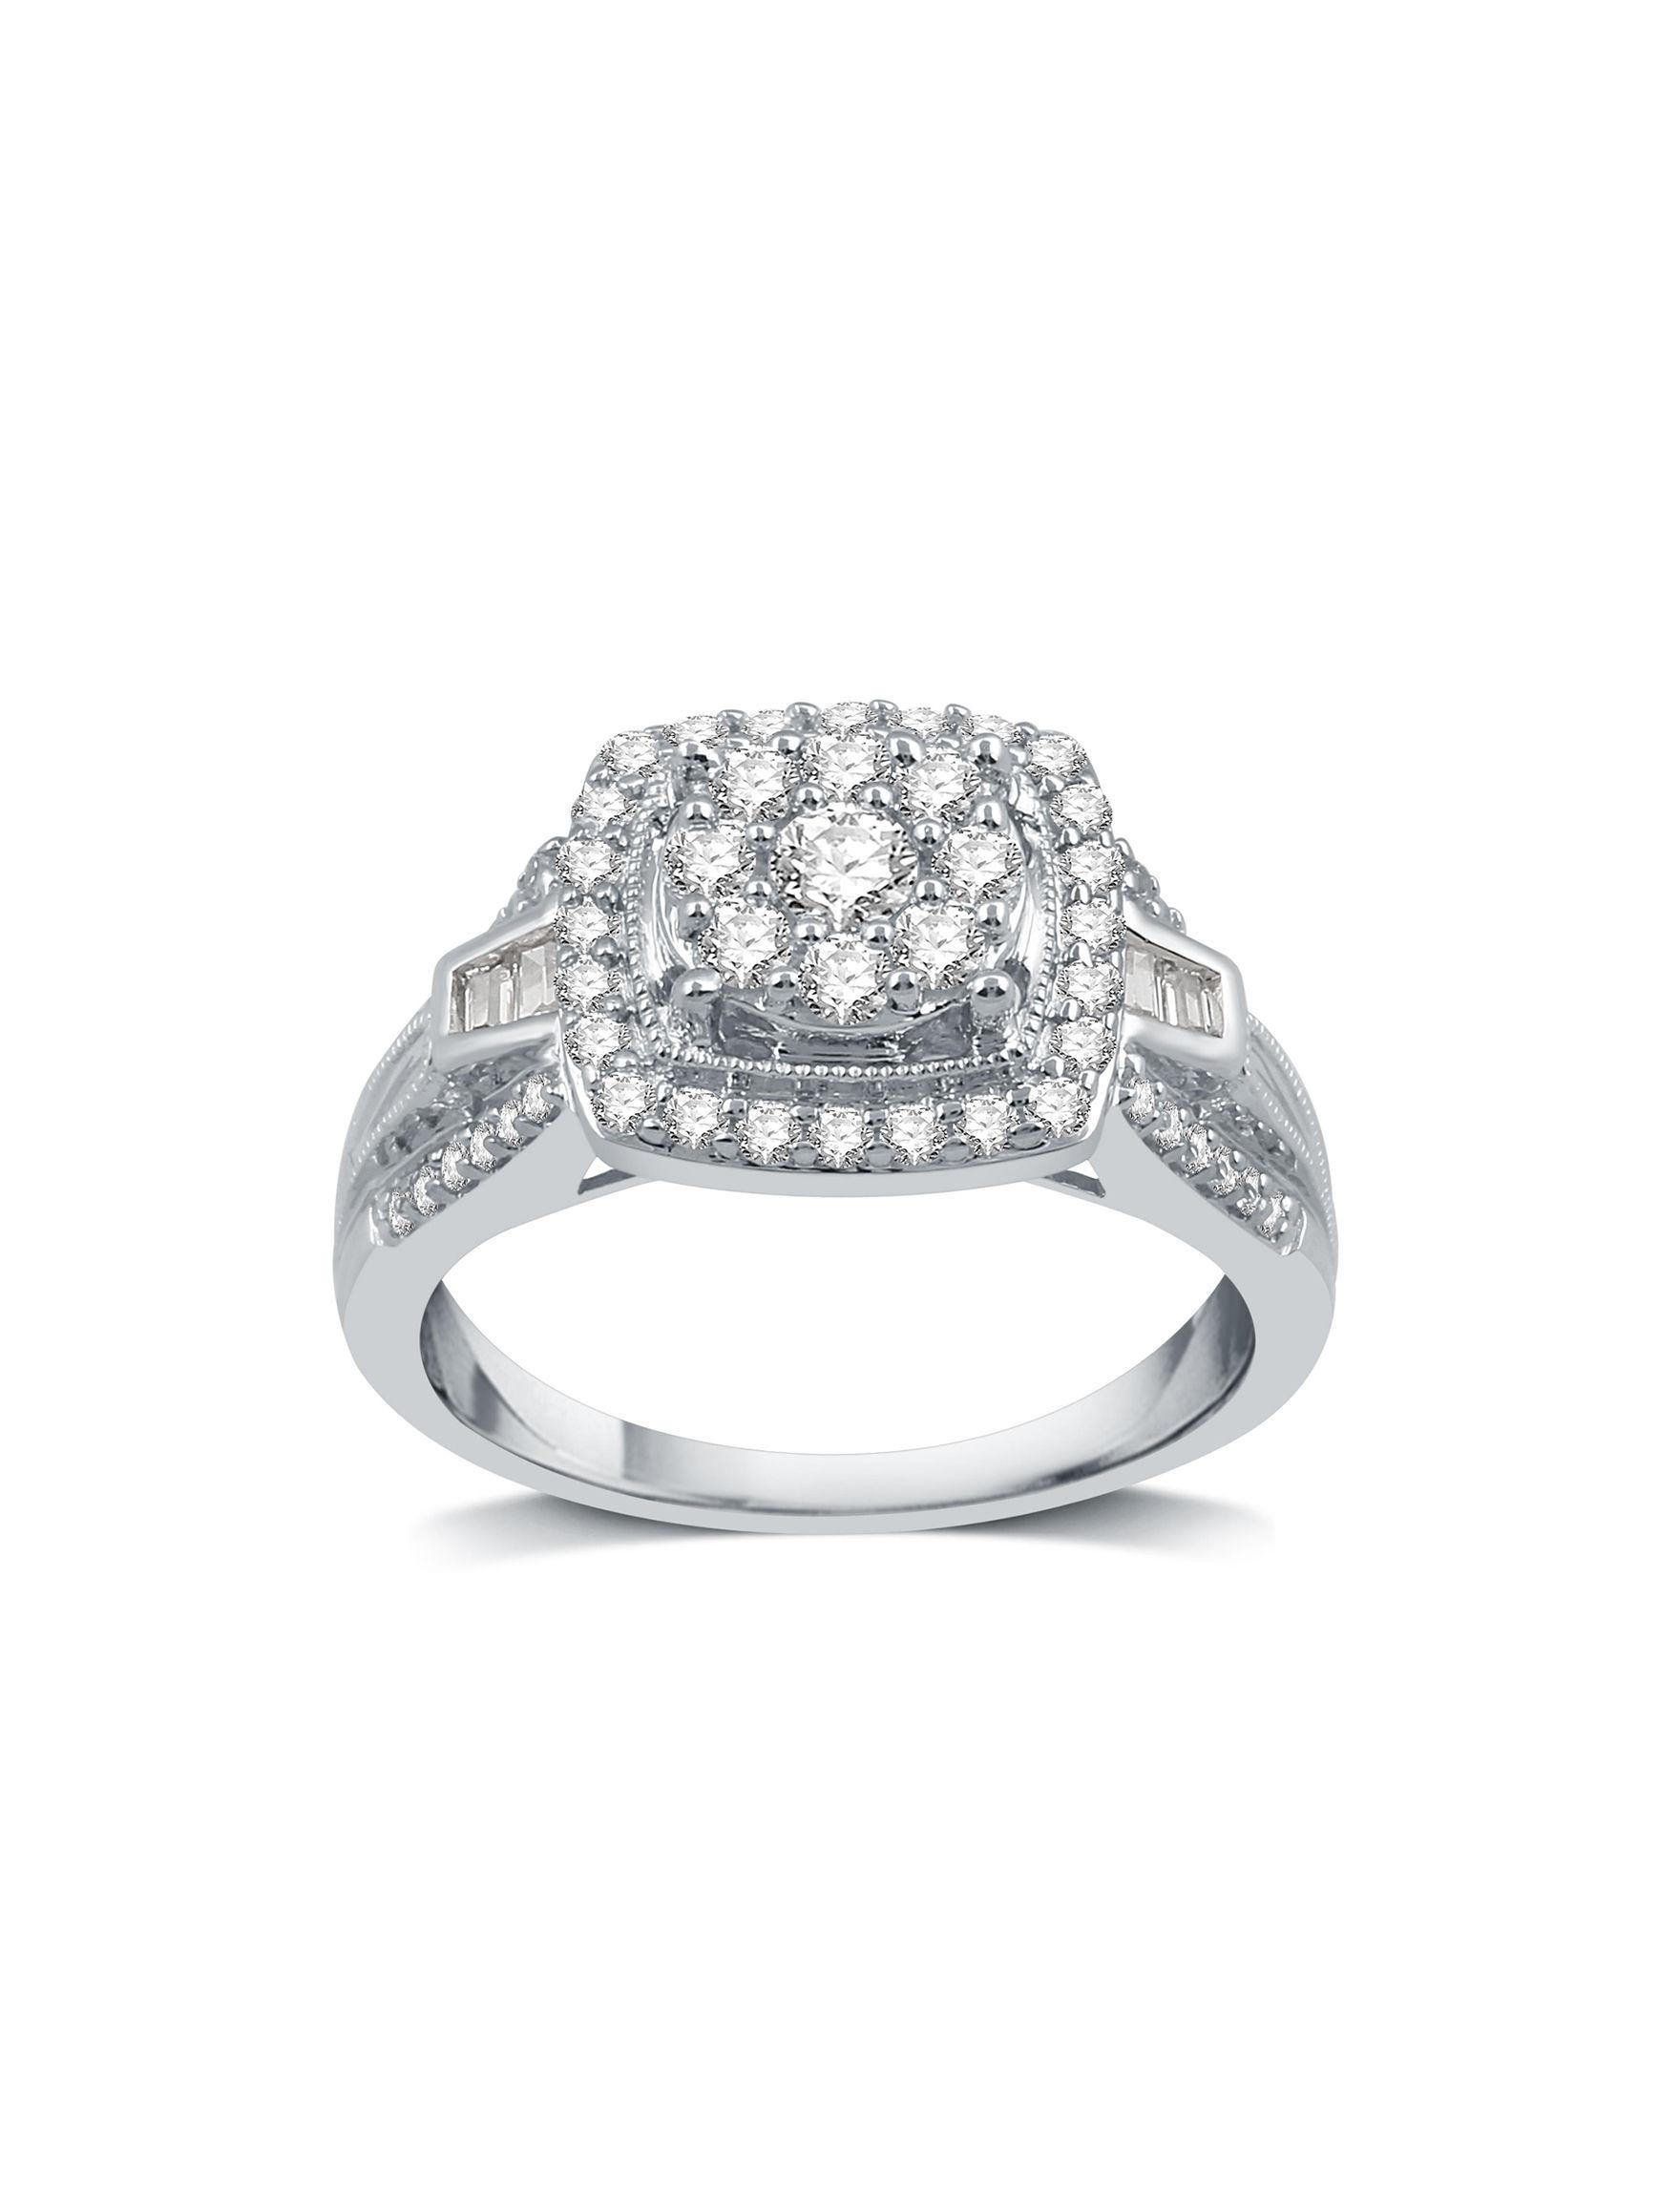 Allure Silver Rings Fine Jewelry